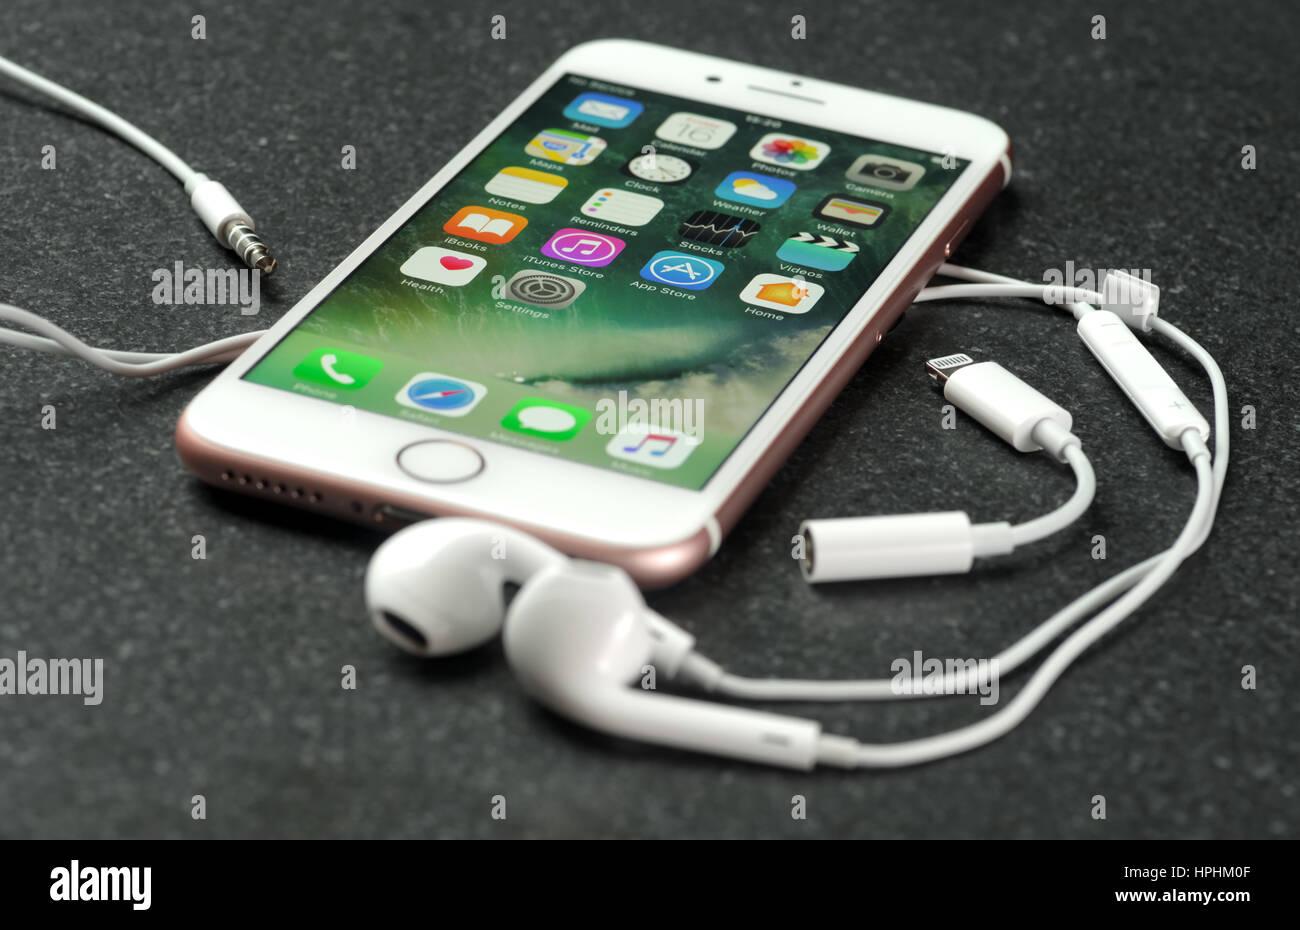 koszalin, poland – february 22, 2017: pink iphone 7 on stone table